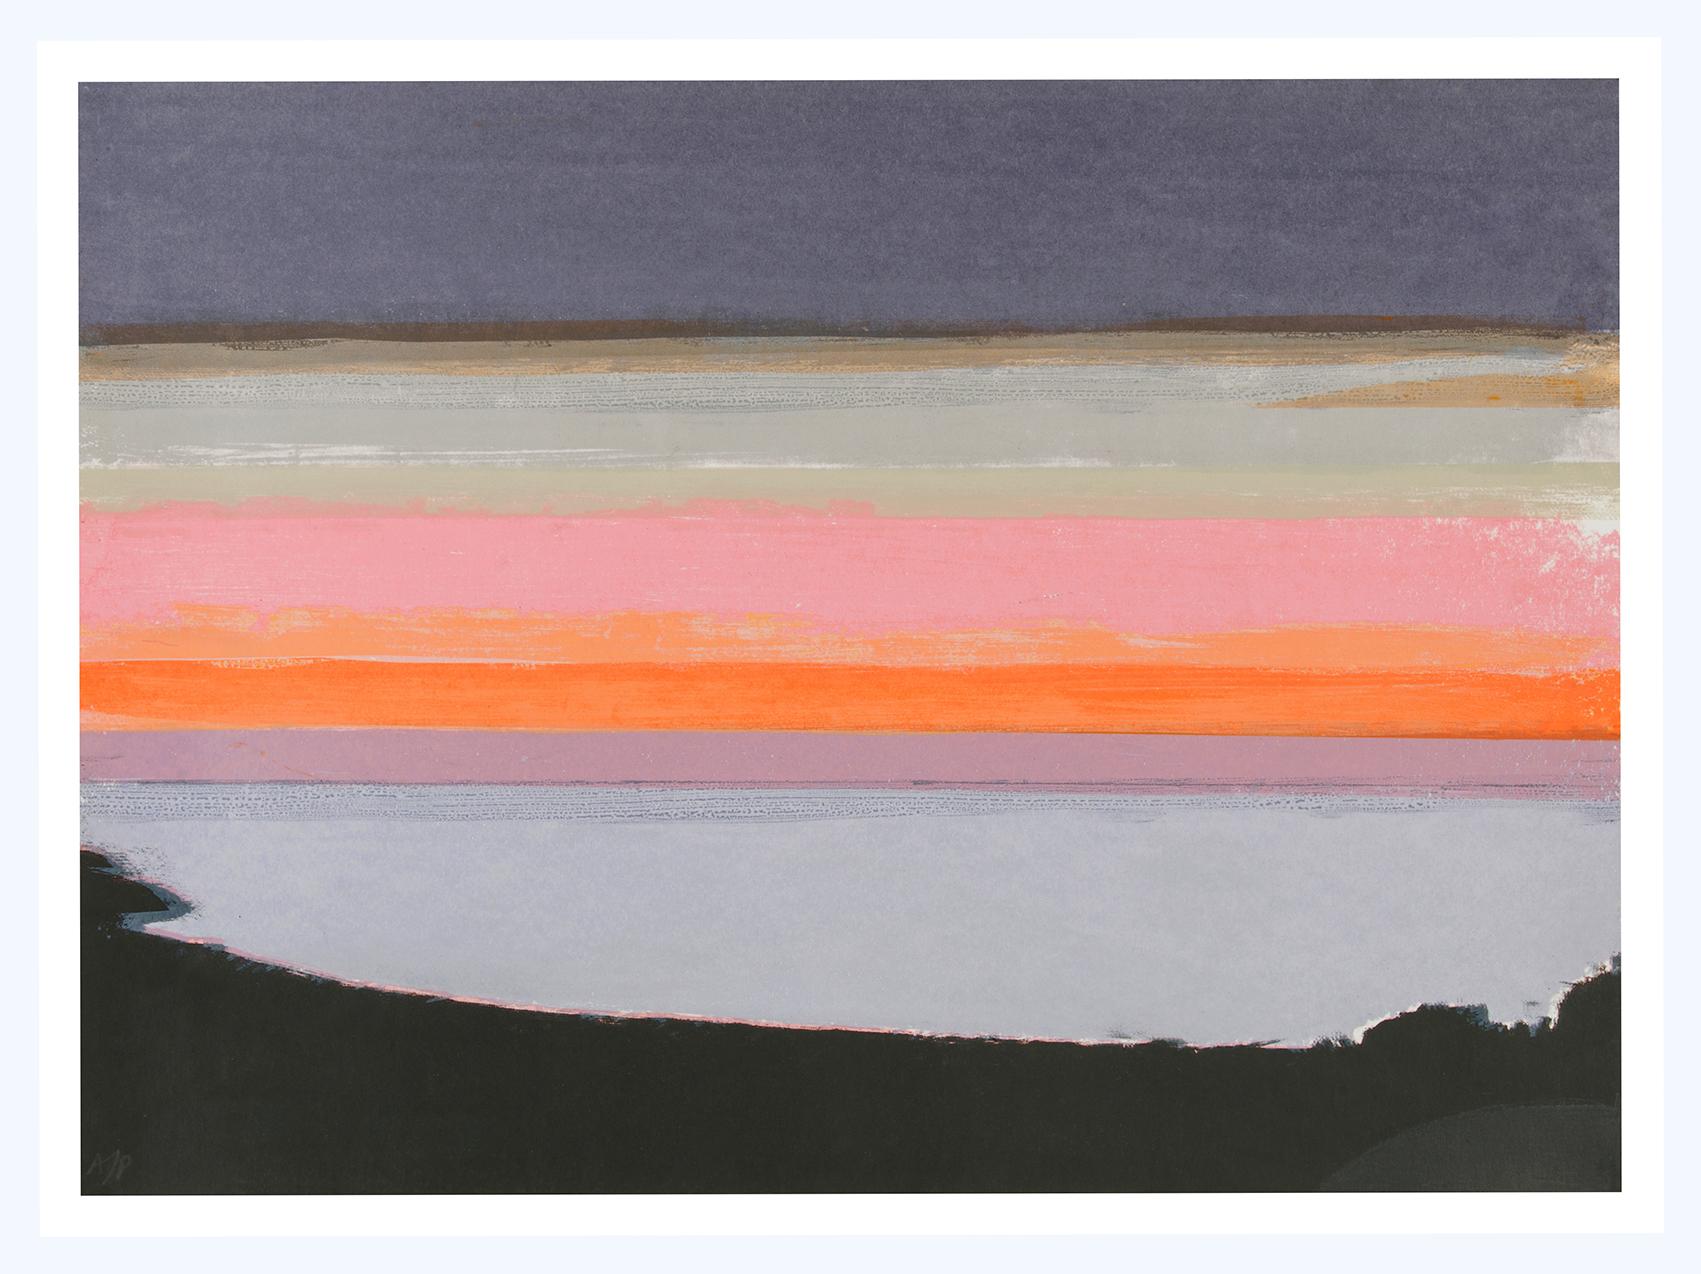 19 Silver Sea, 38x52cm, screen print, ed of 5